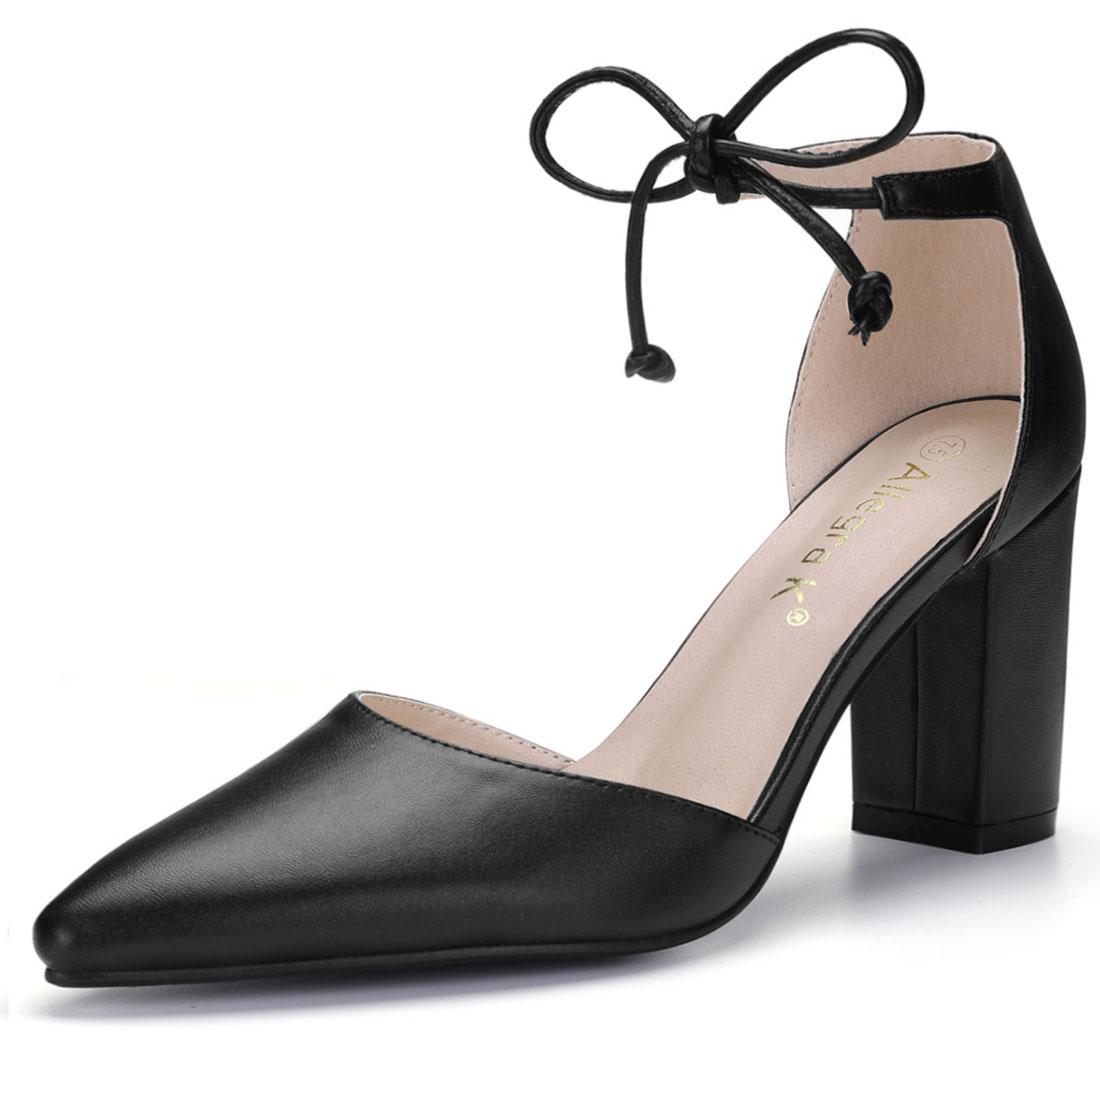 Allegra K Women's Chunky Heel Pointed Toe Dress Pumps Black US 7.5